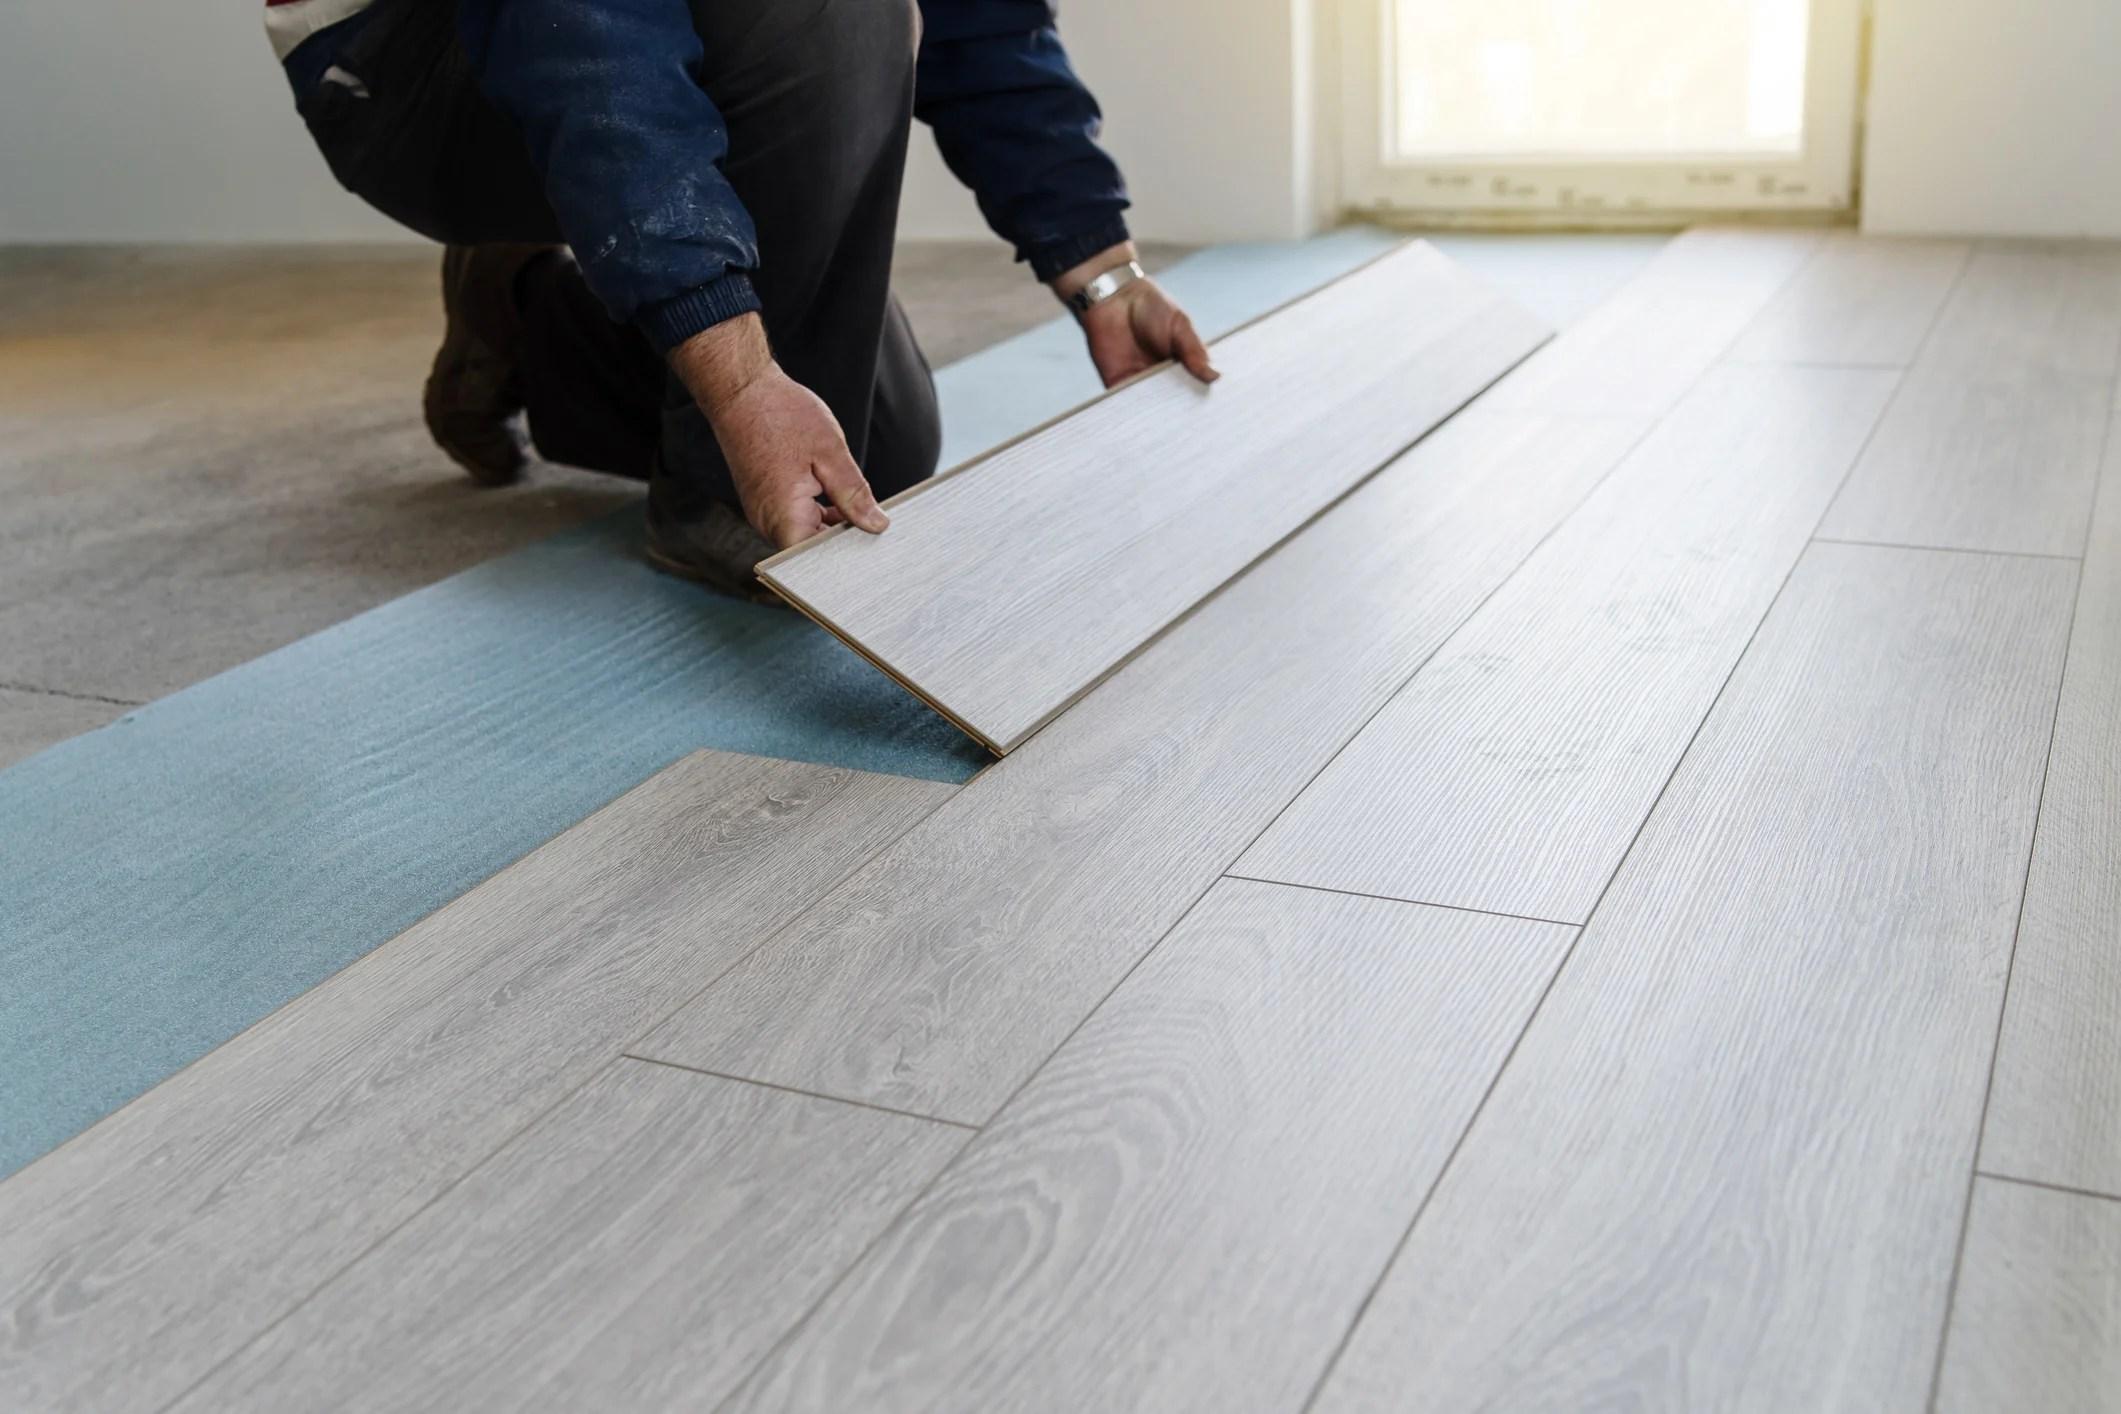 cheap and easy temporary flooring ideas